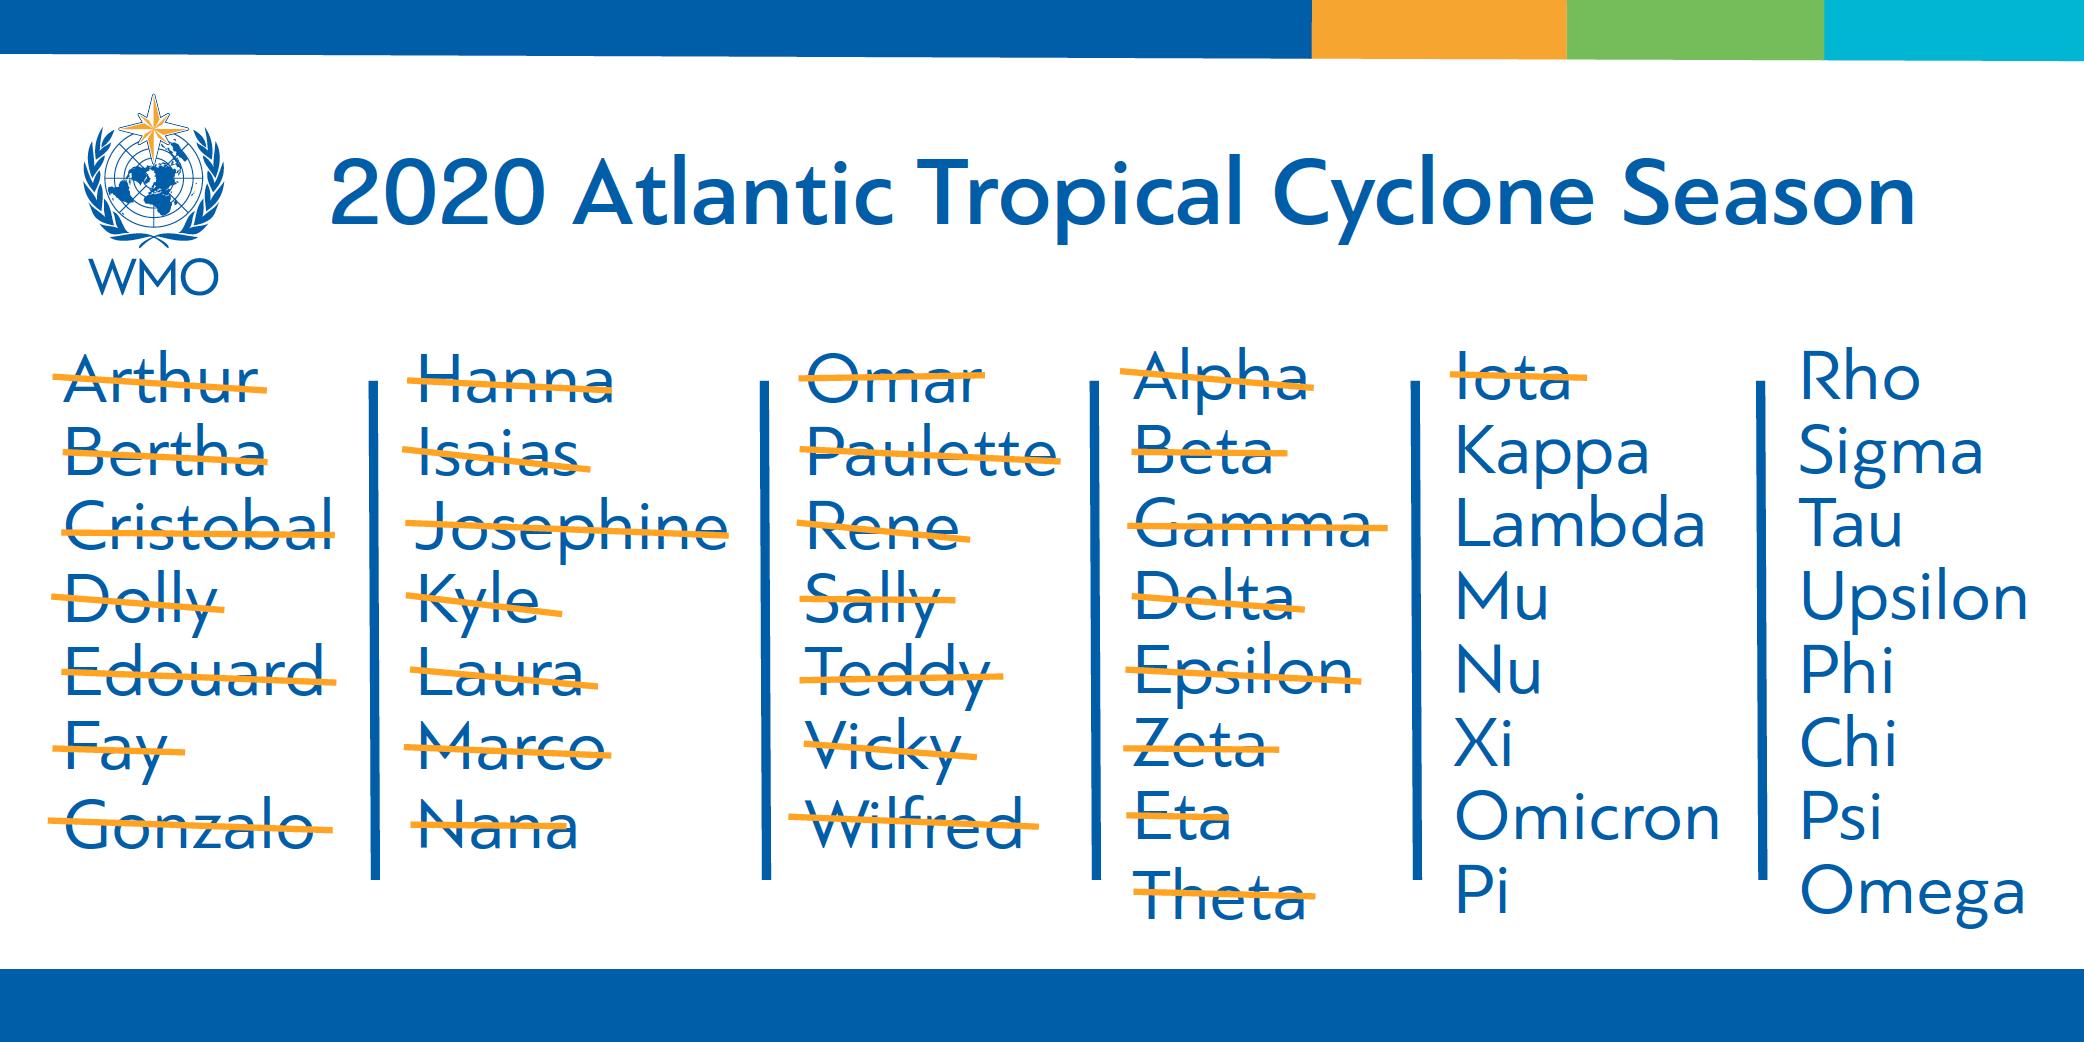 2020_Hurricane_Season_Names